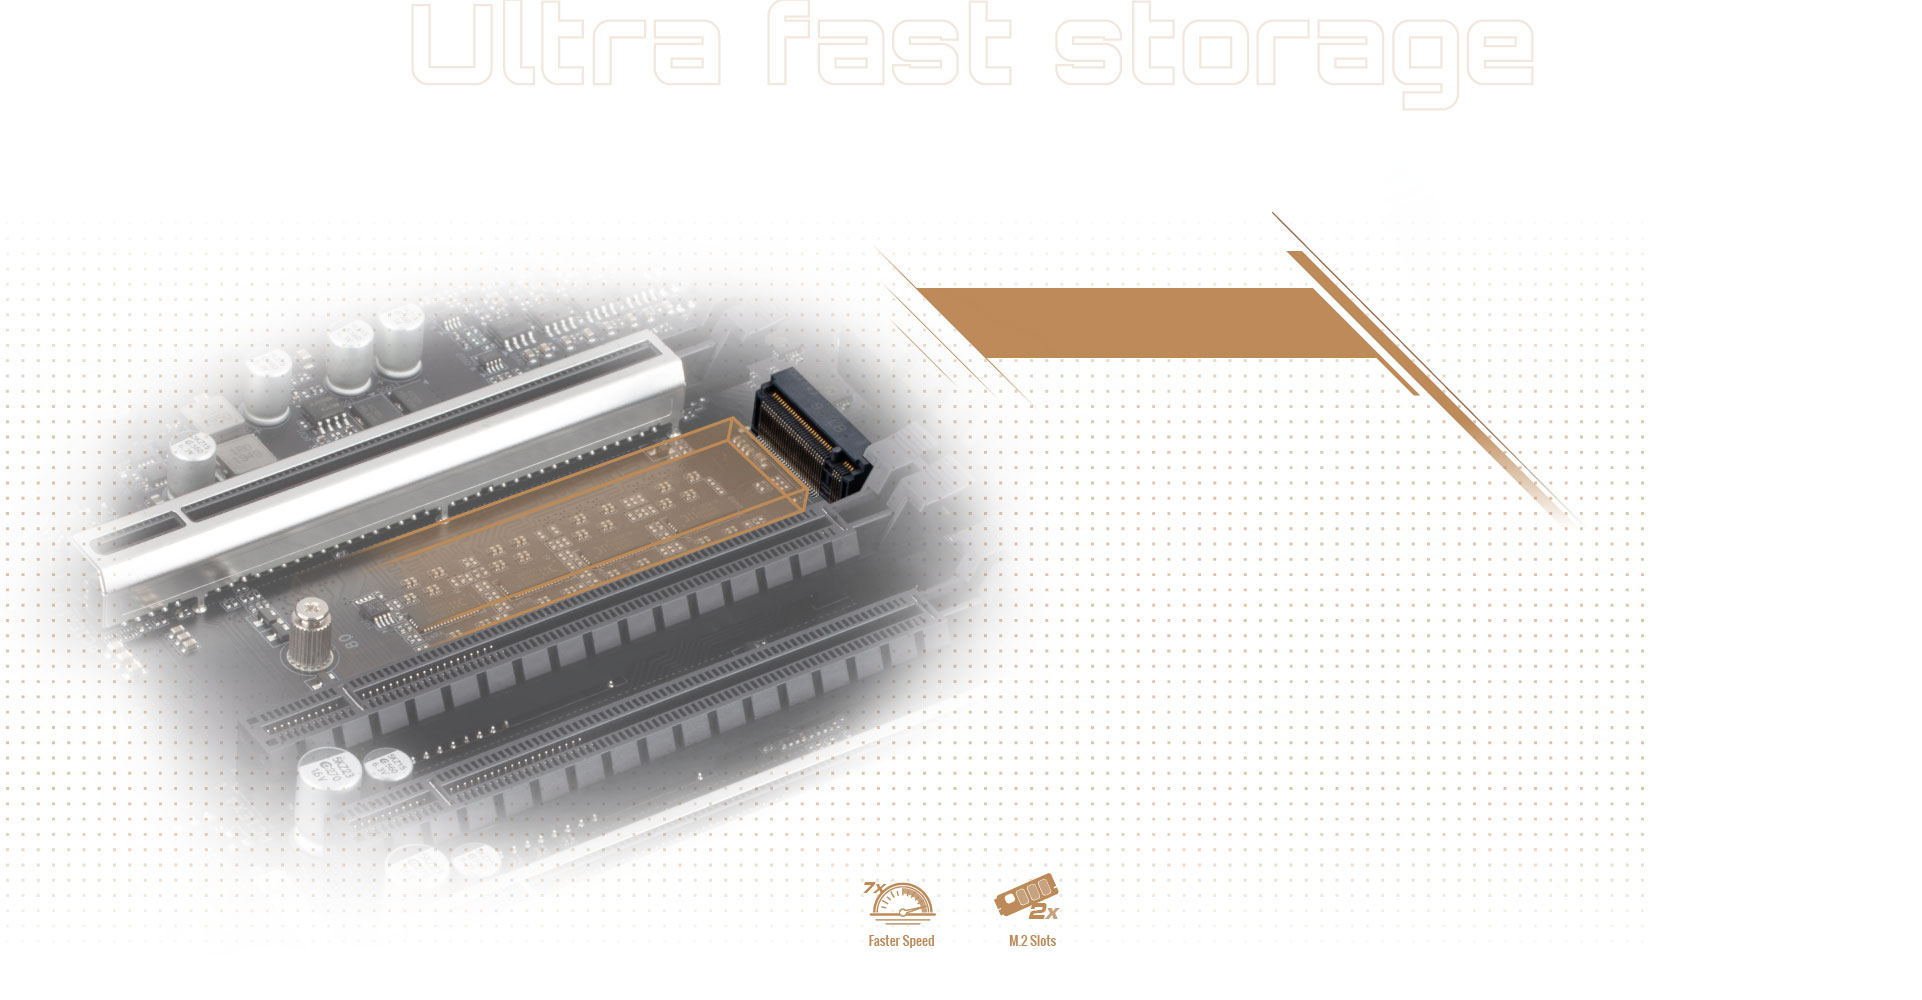 Mainboard Gigabyte W480 VISION W